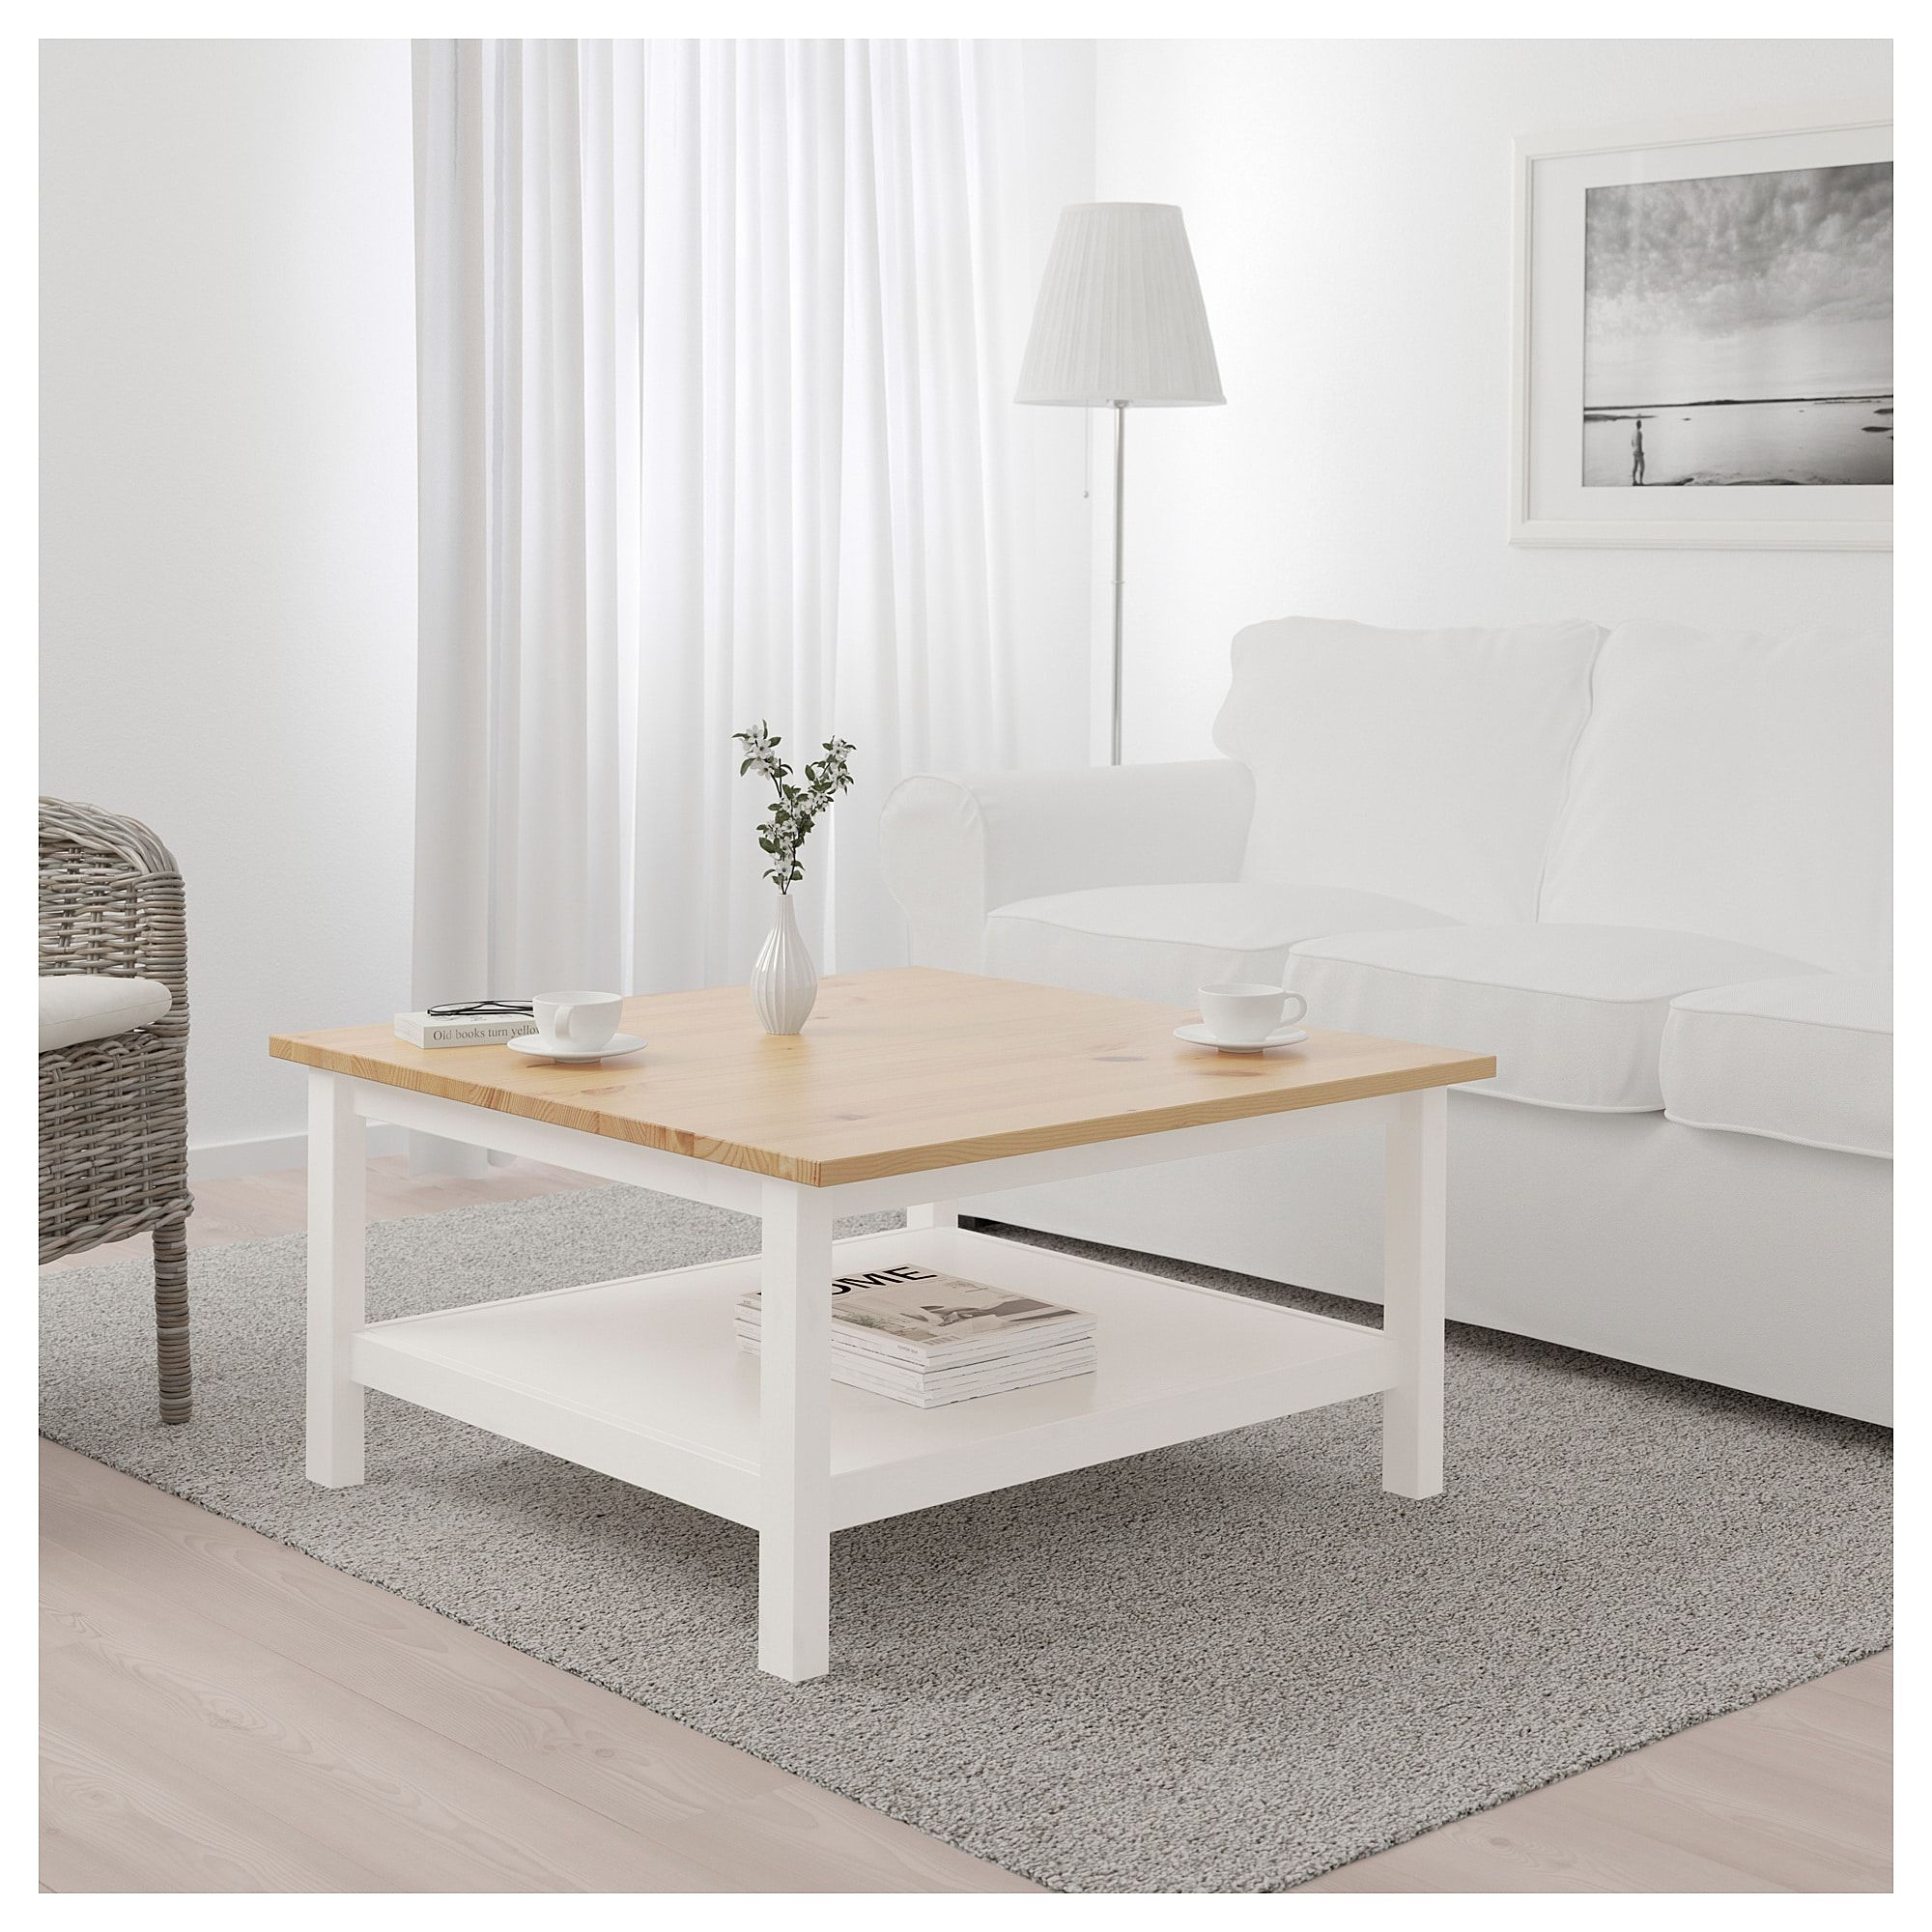 Hemnes Coffee Table White Stain Light Brown White Stain Light